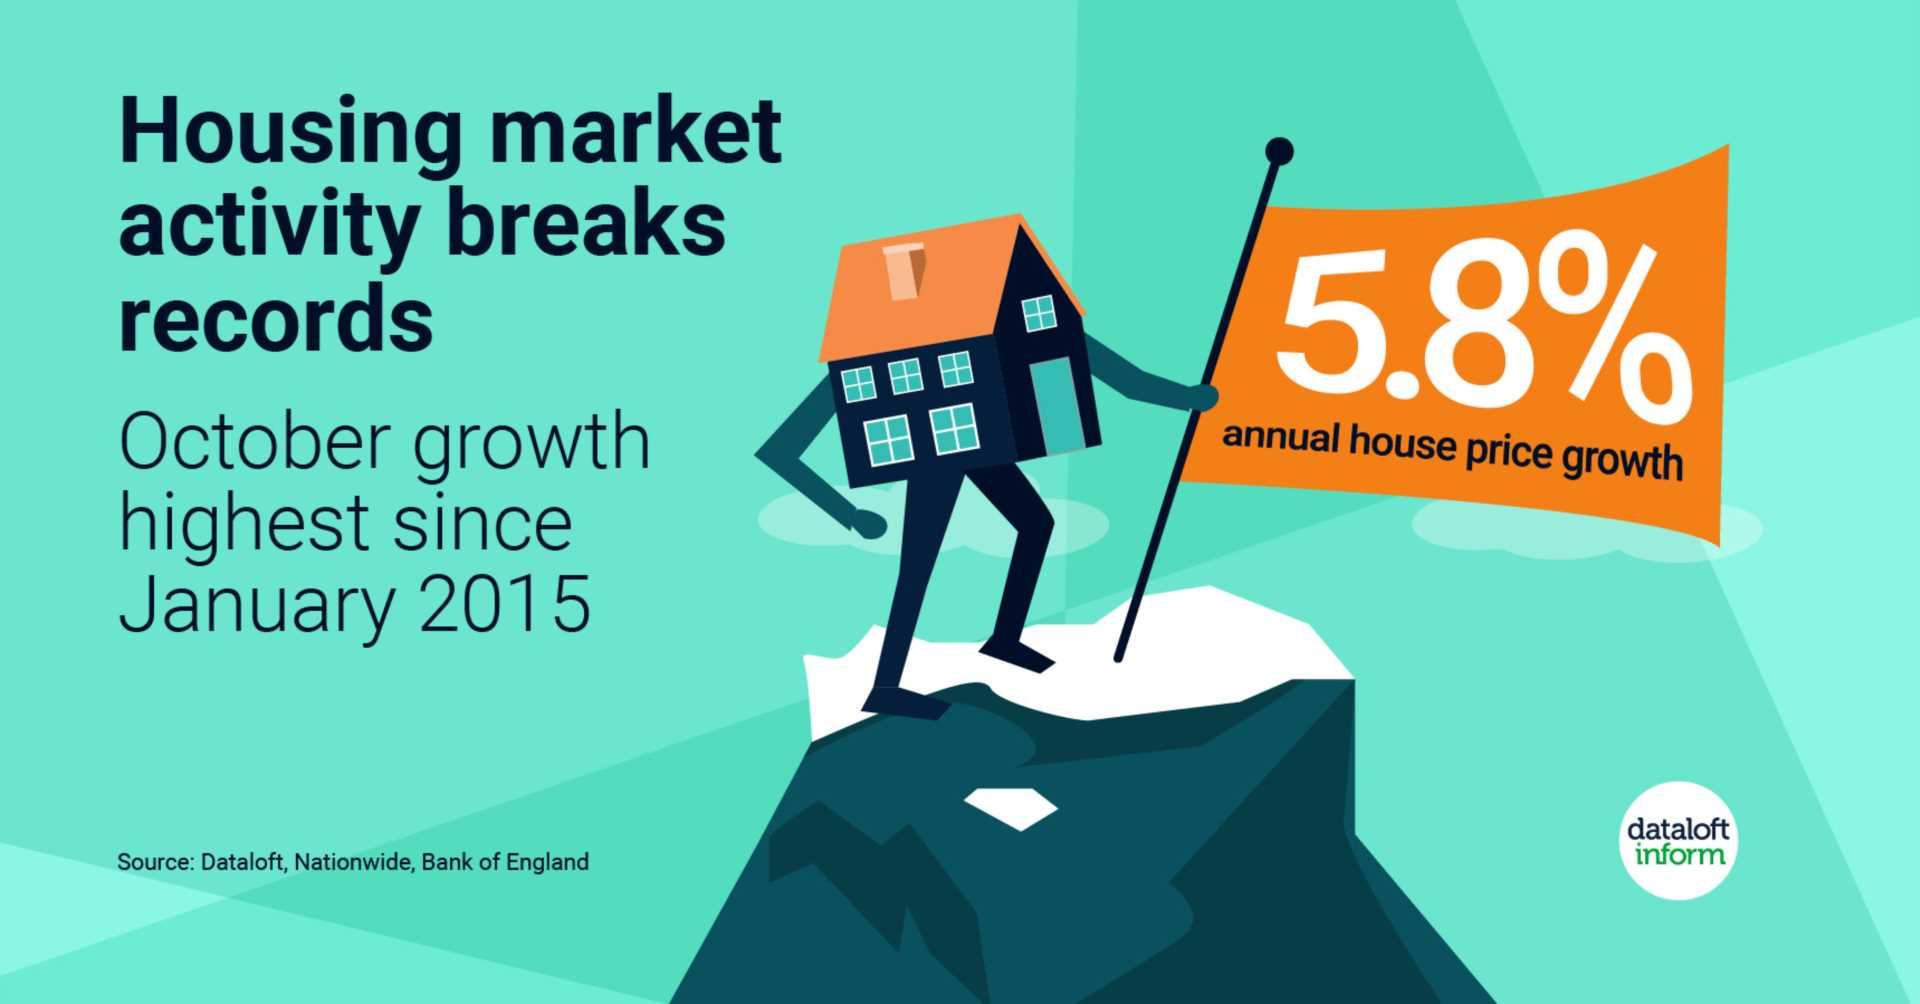 Housing market activity breaks records